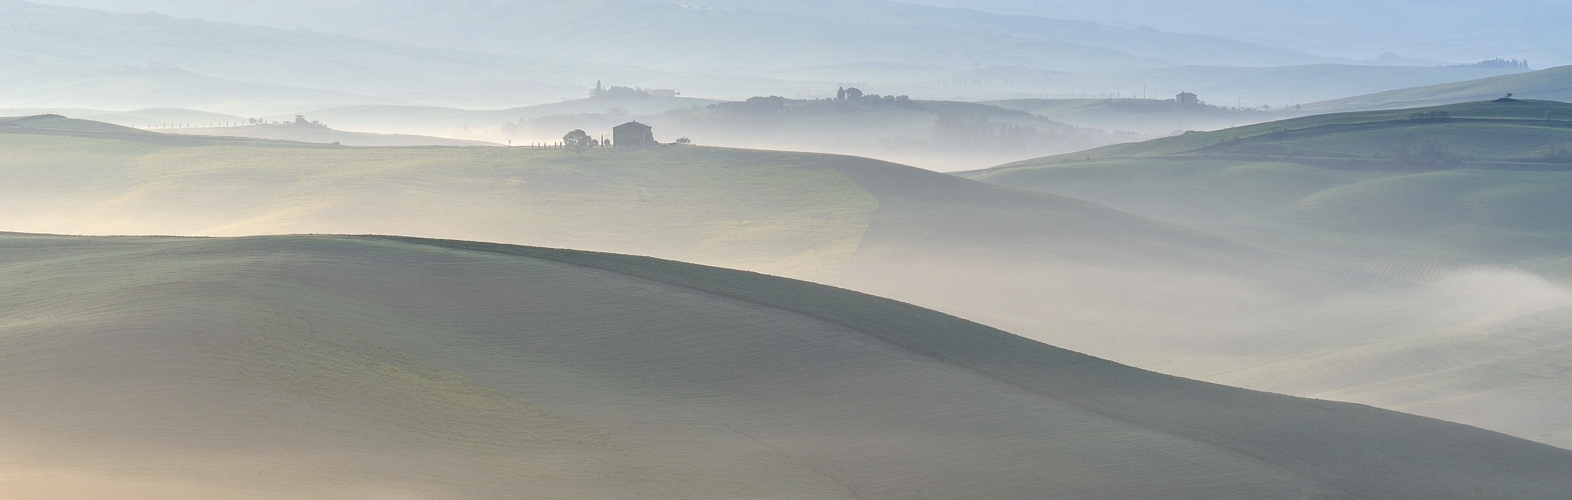 *Toskana - Nebel*